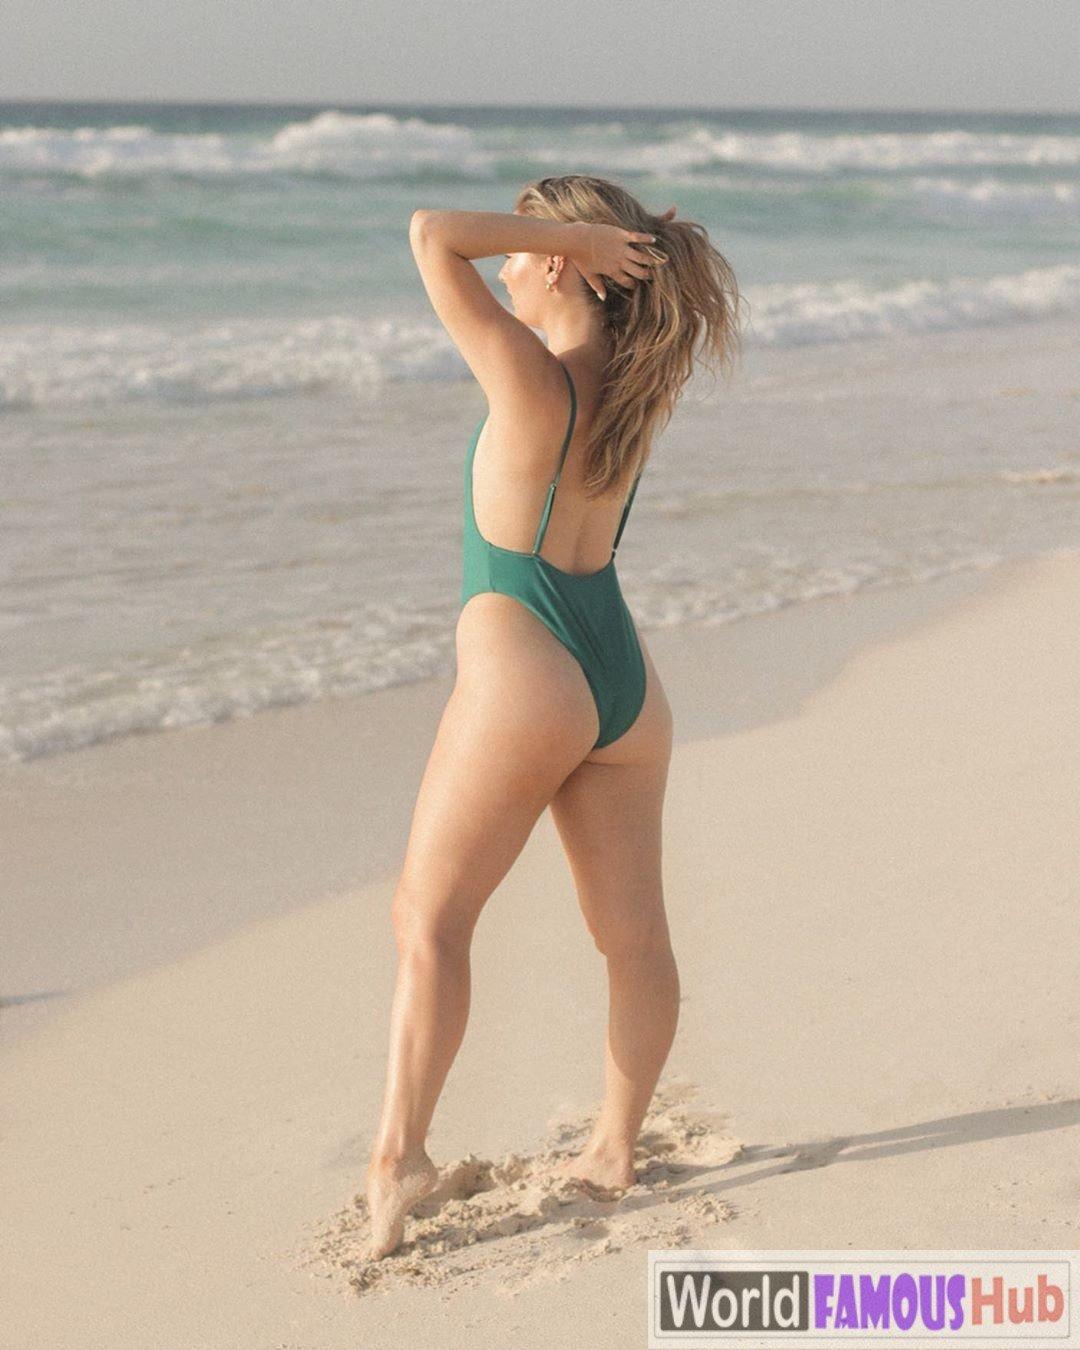 Mikayla Greenwood